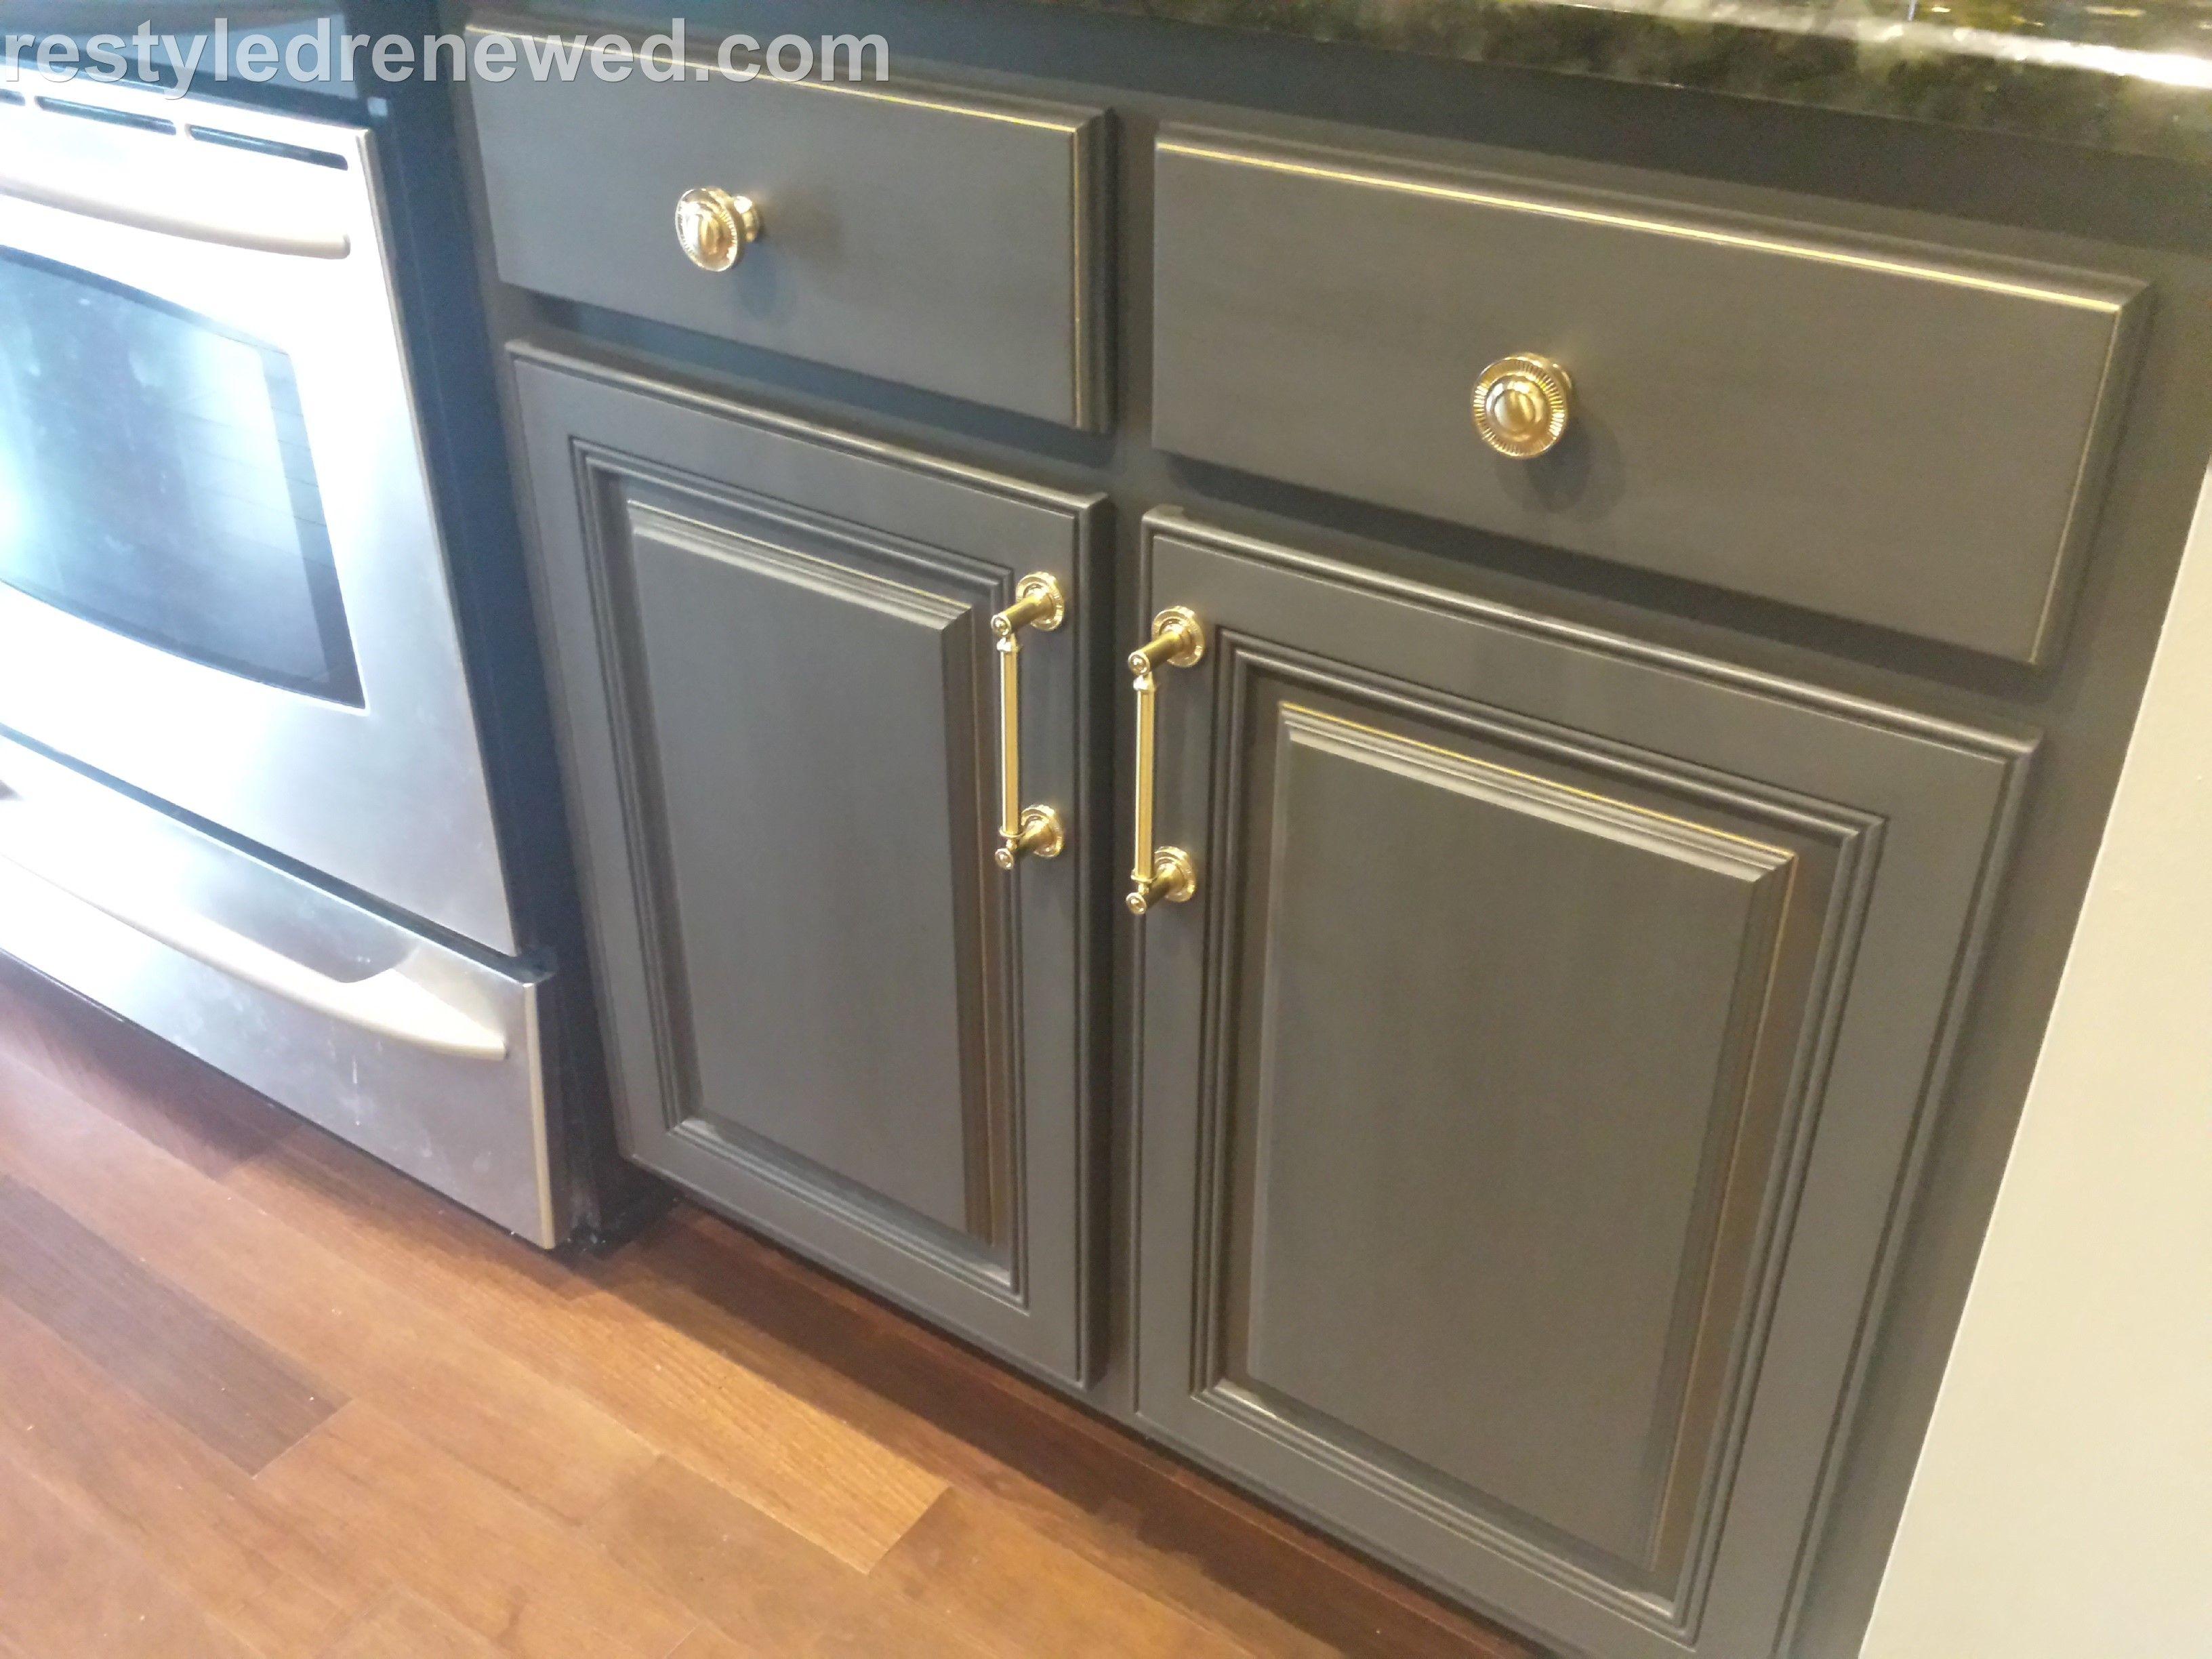 Annie Sloan Chalk Paint In Graphite Dark Wax I Added A Gold Edging We Installed Painted Furniture Painting Kitchen Cabinets Annie Sloan Chalk Paint Graphite